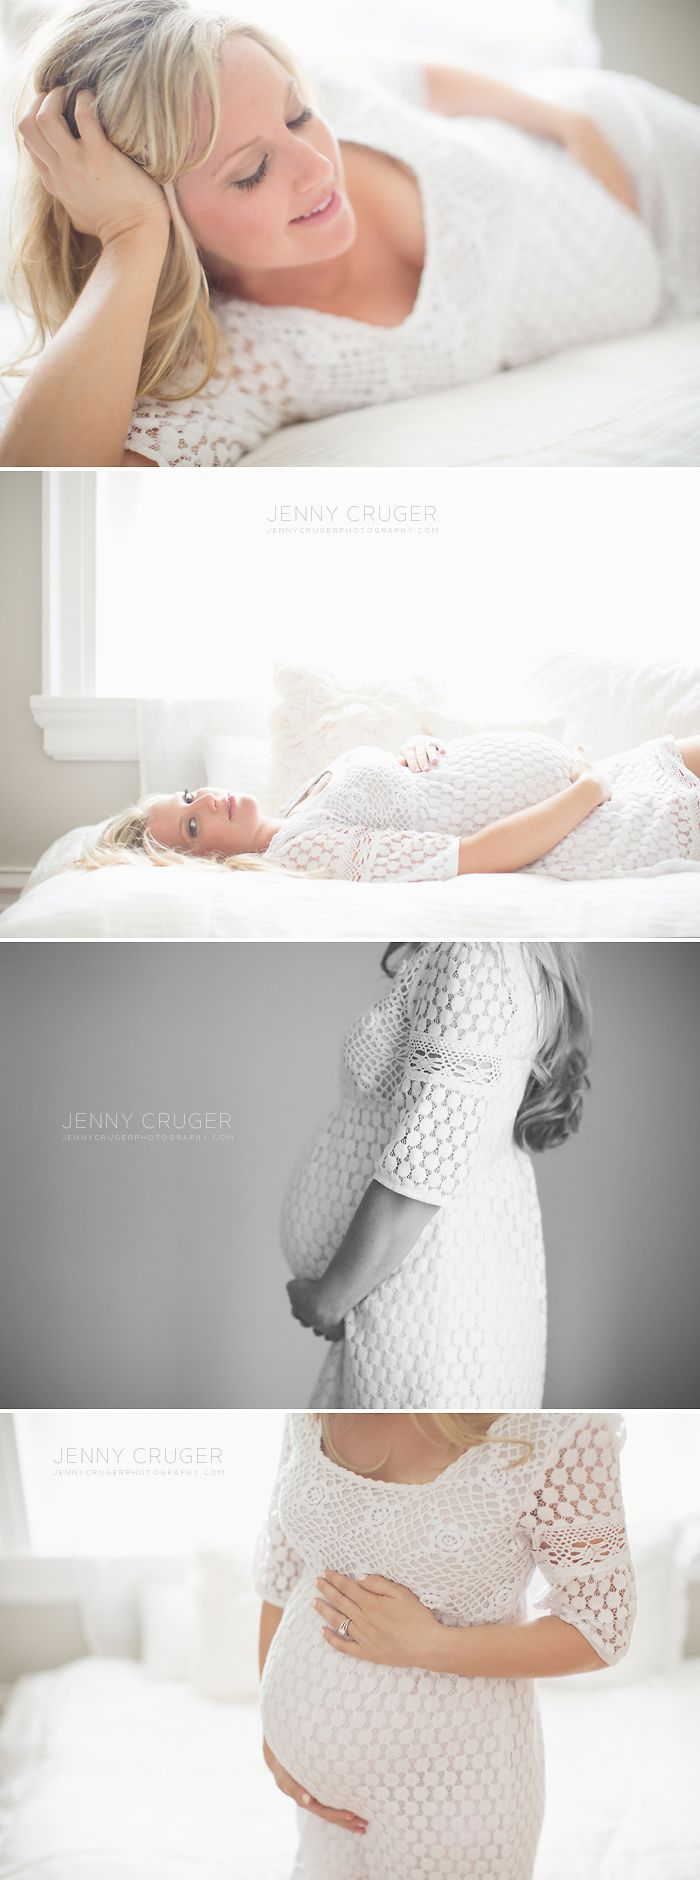 franklin tn maternity photographer . mary elizabeth | jenny cruger photography